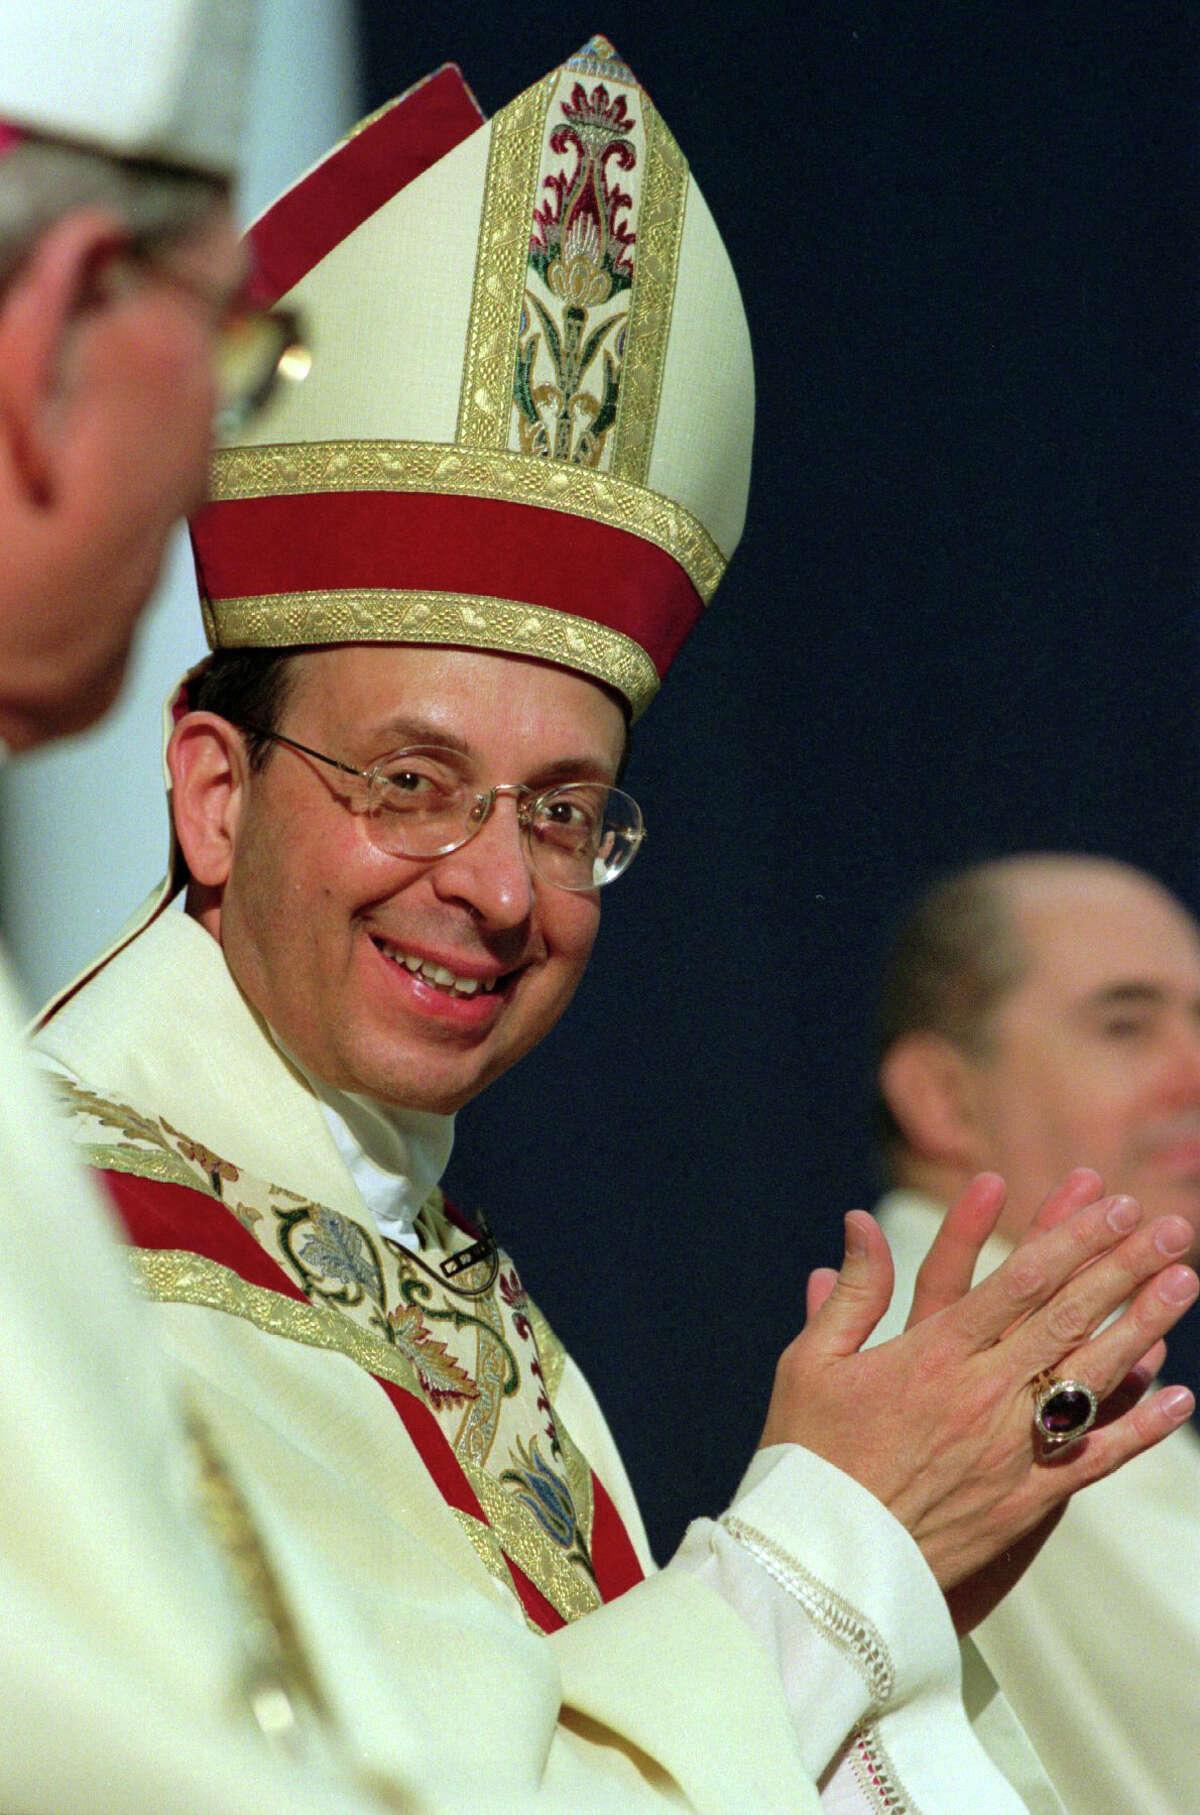 Bishop William E. Lori installation as the forth Bishop of Bridgeport in 2001.